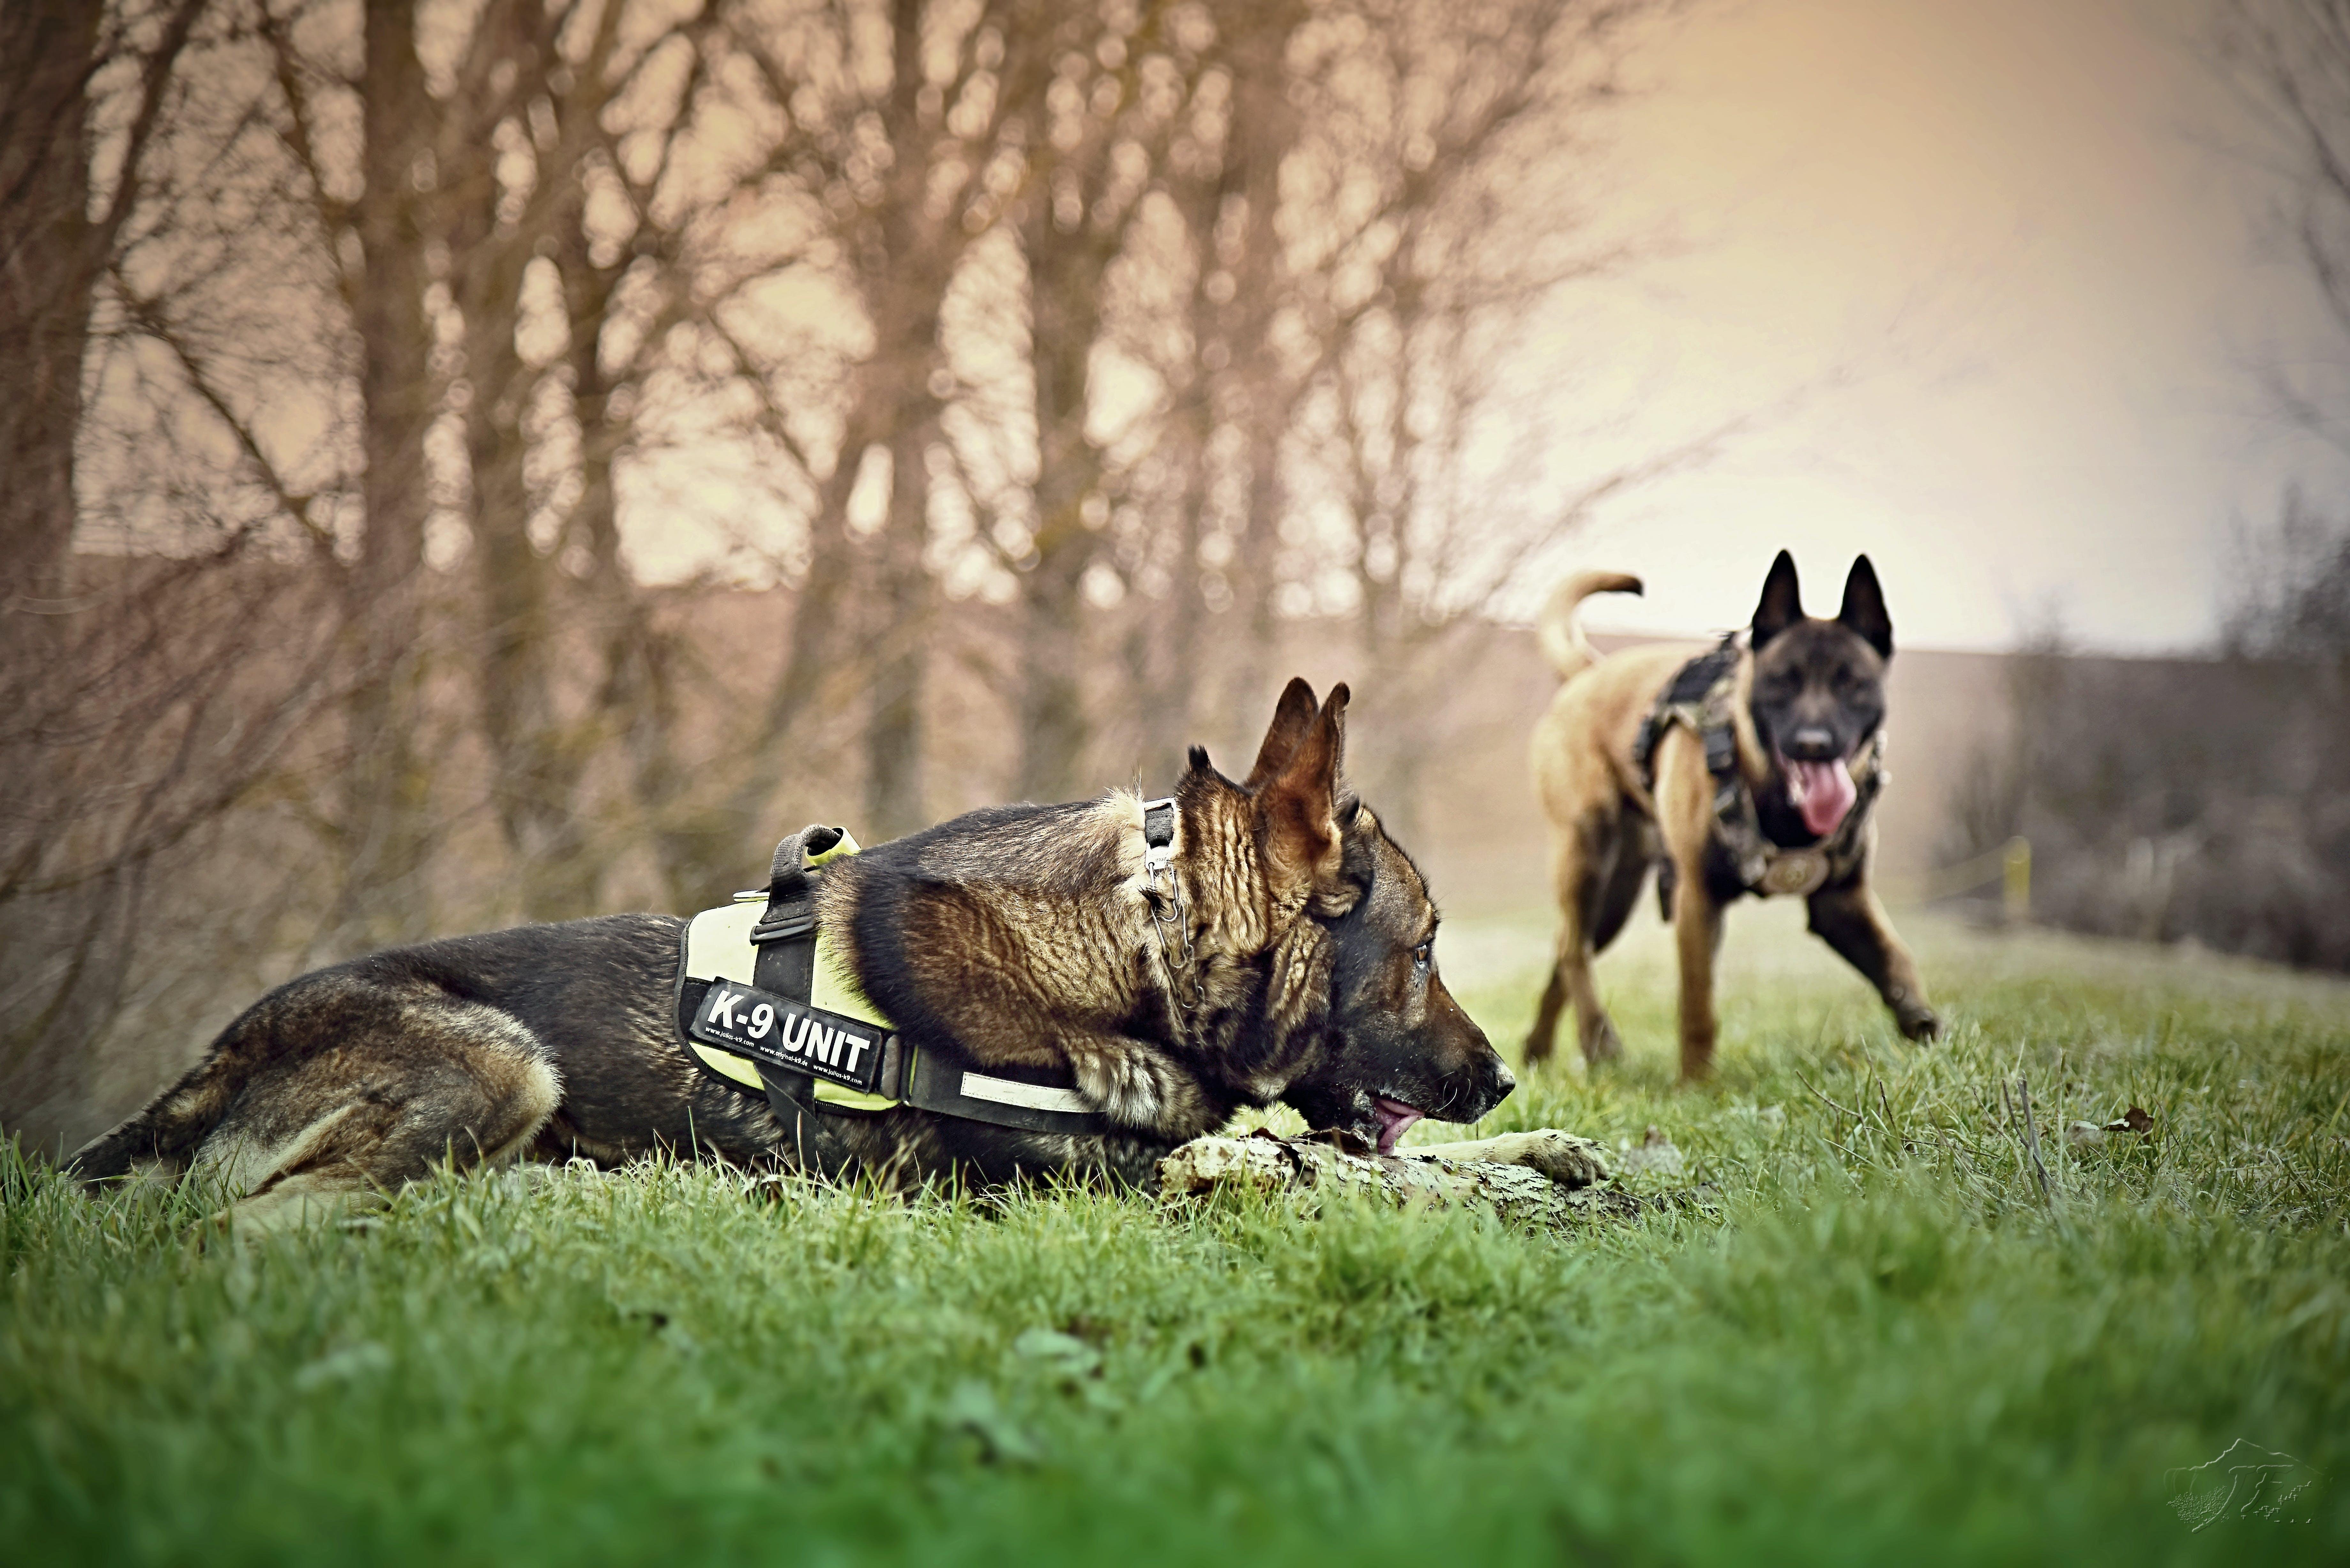 belgian malinois, dog friends, dogs